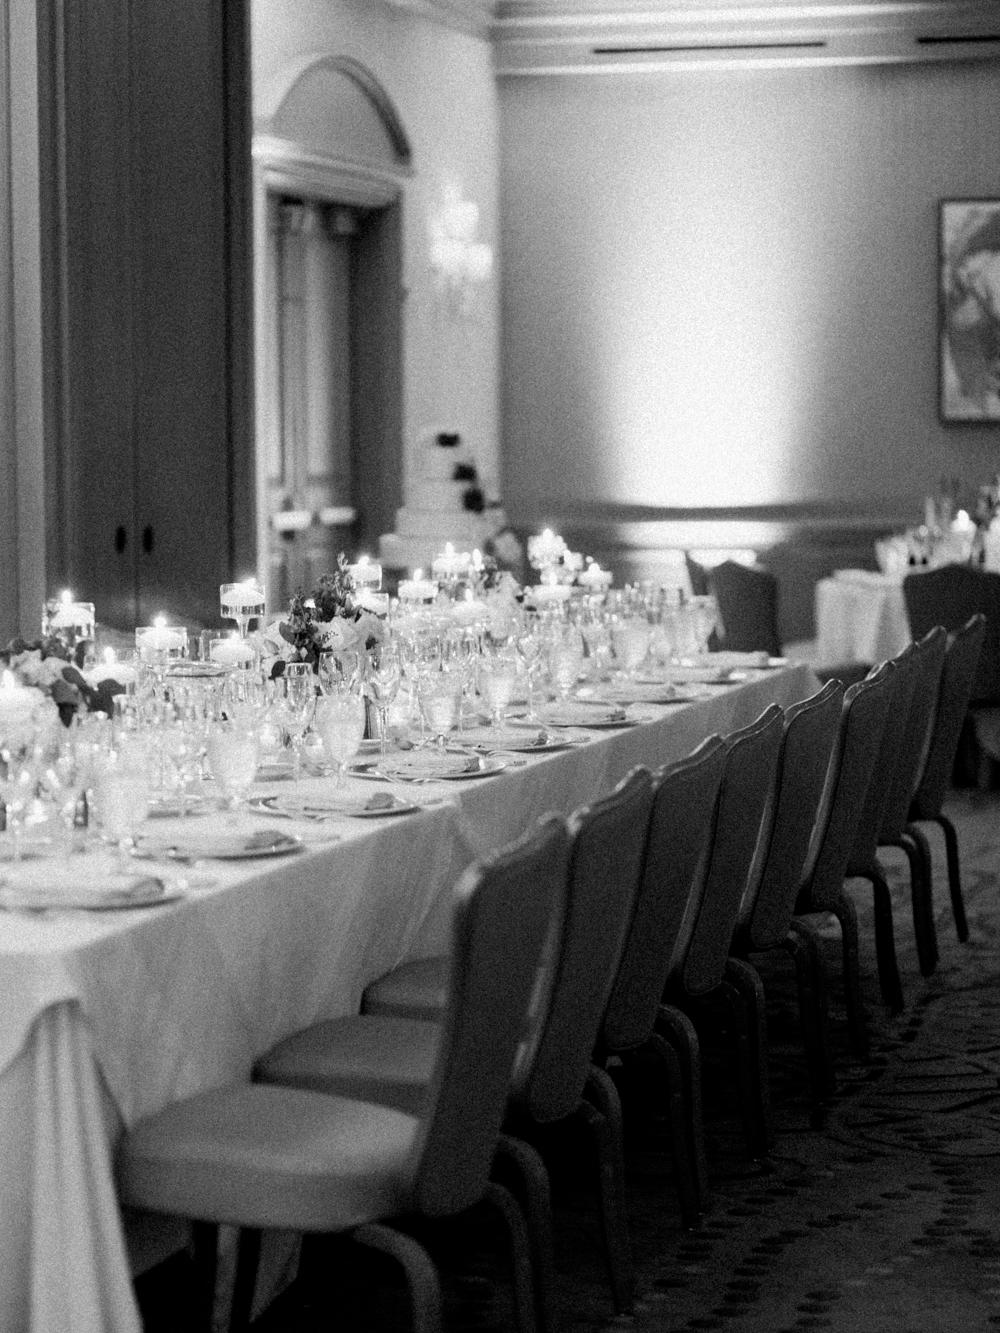 Christine Gosch - destination film photographer - houston wedding photographer - fine art film photographer - elopement photographer - destination wedding - understated wedding - simple beautiful wedding photography-10.jpg